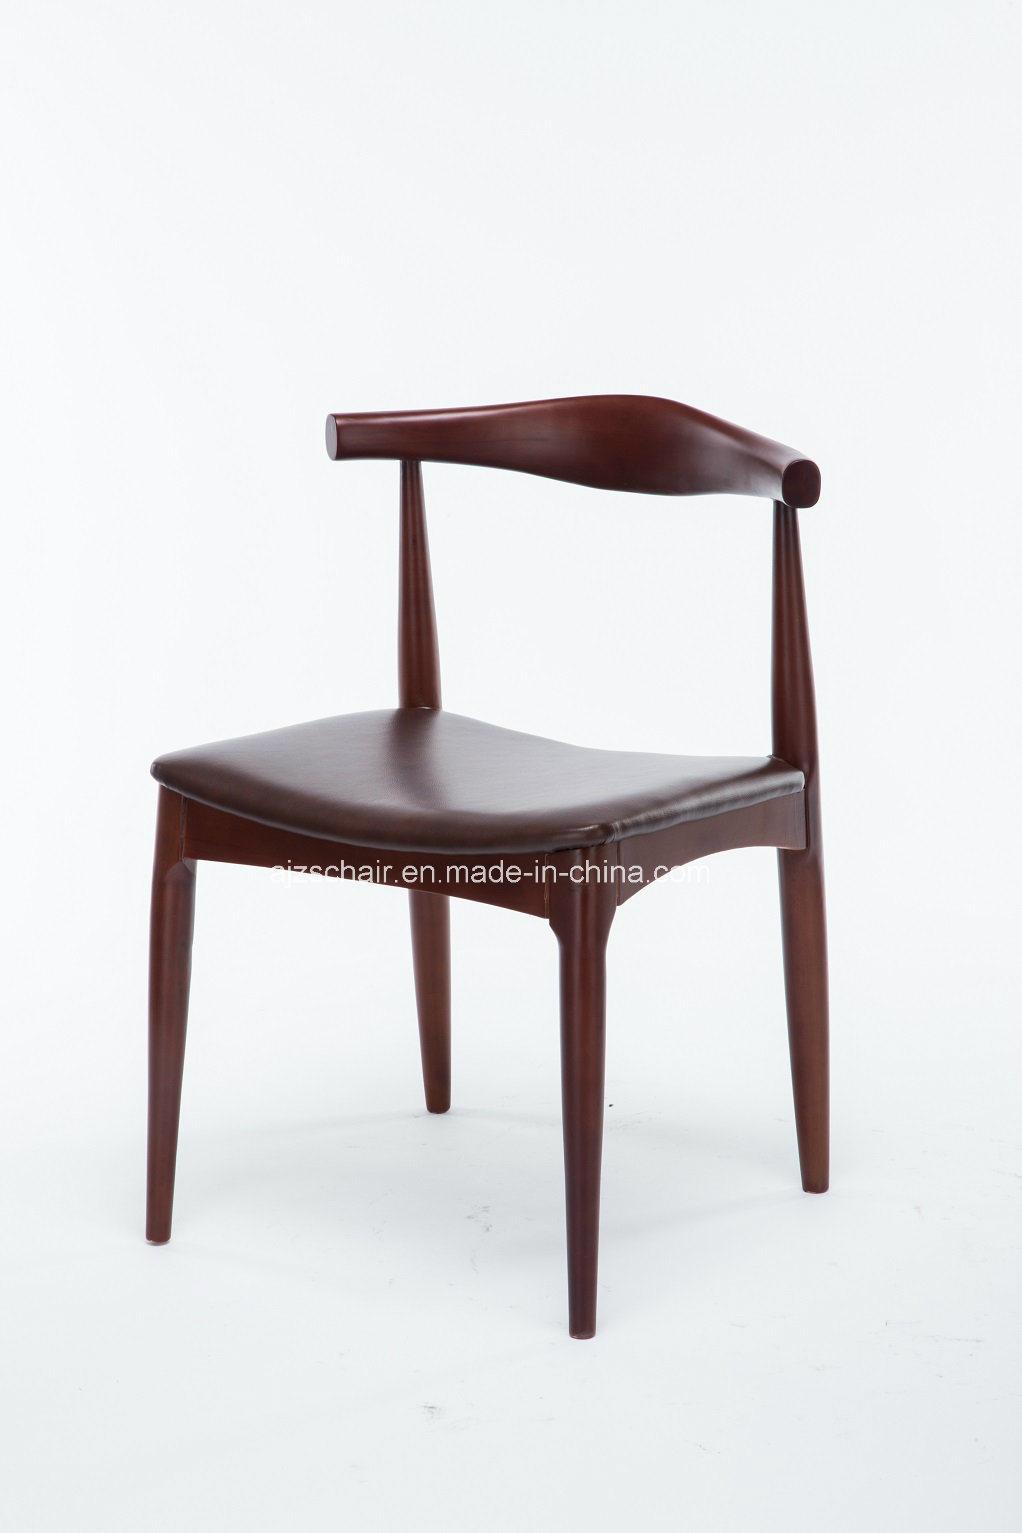 Modern Solid Wood Restaurant Ox Horn Chair/Wood Restaurant Chair Ox Chair Zs-T-N01